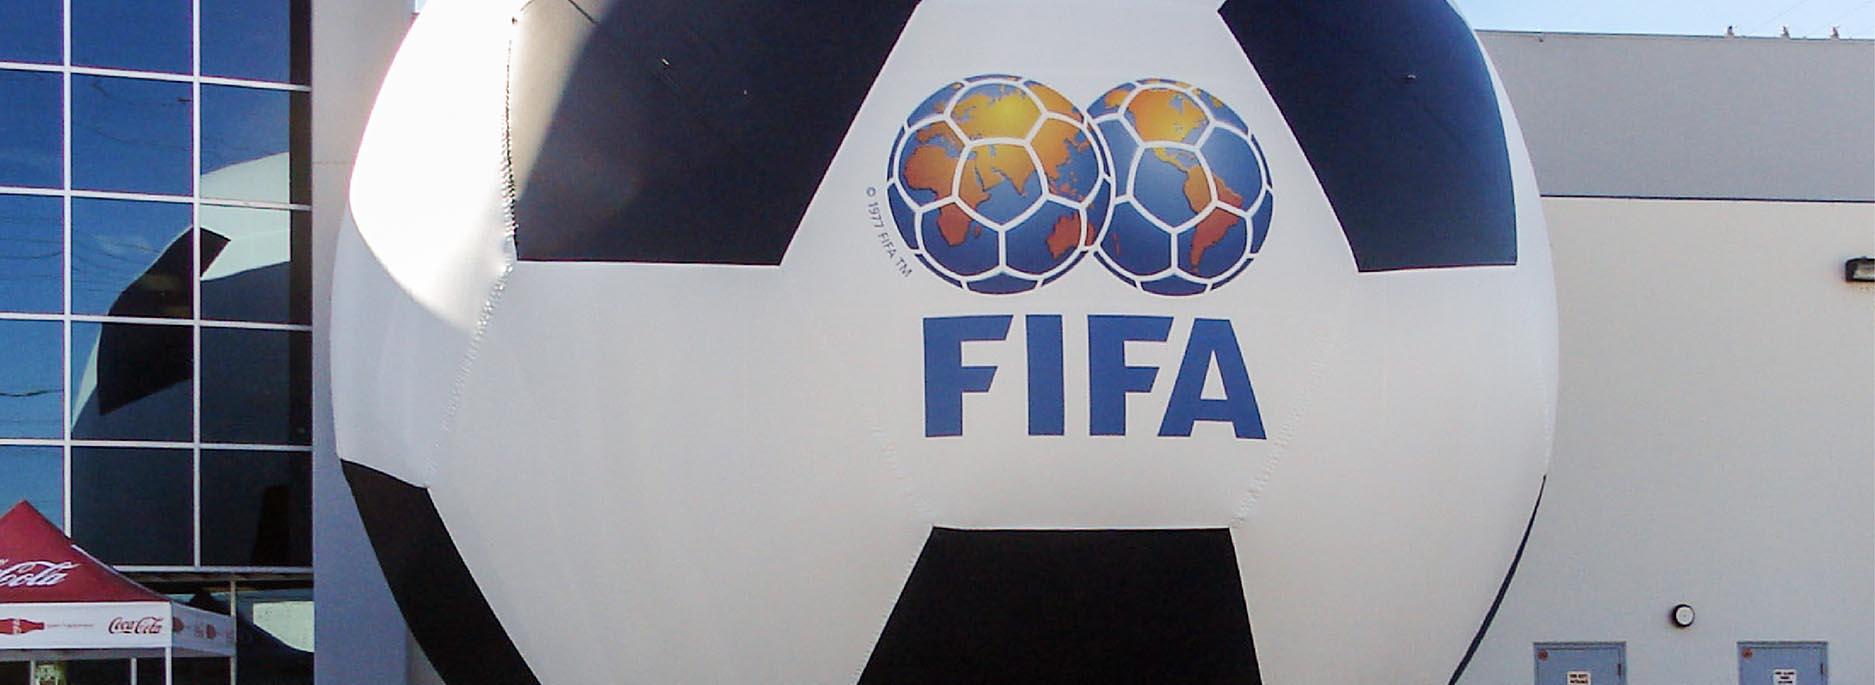 Inflatable FIFA soccer ball replica